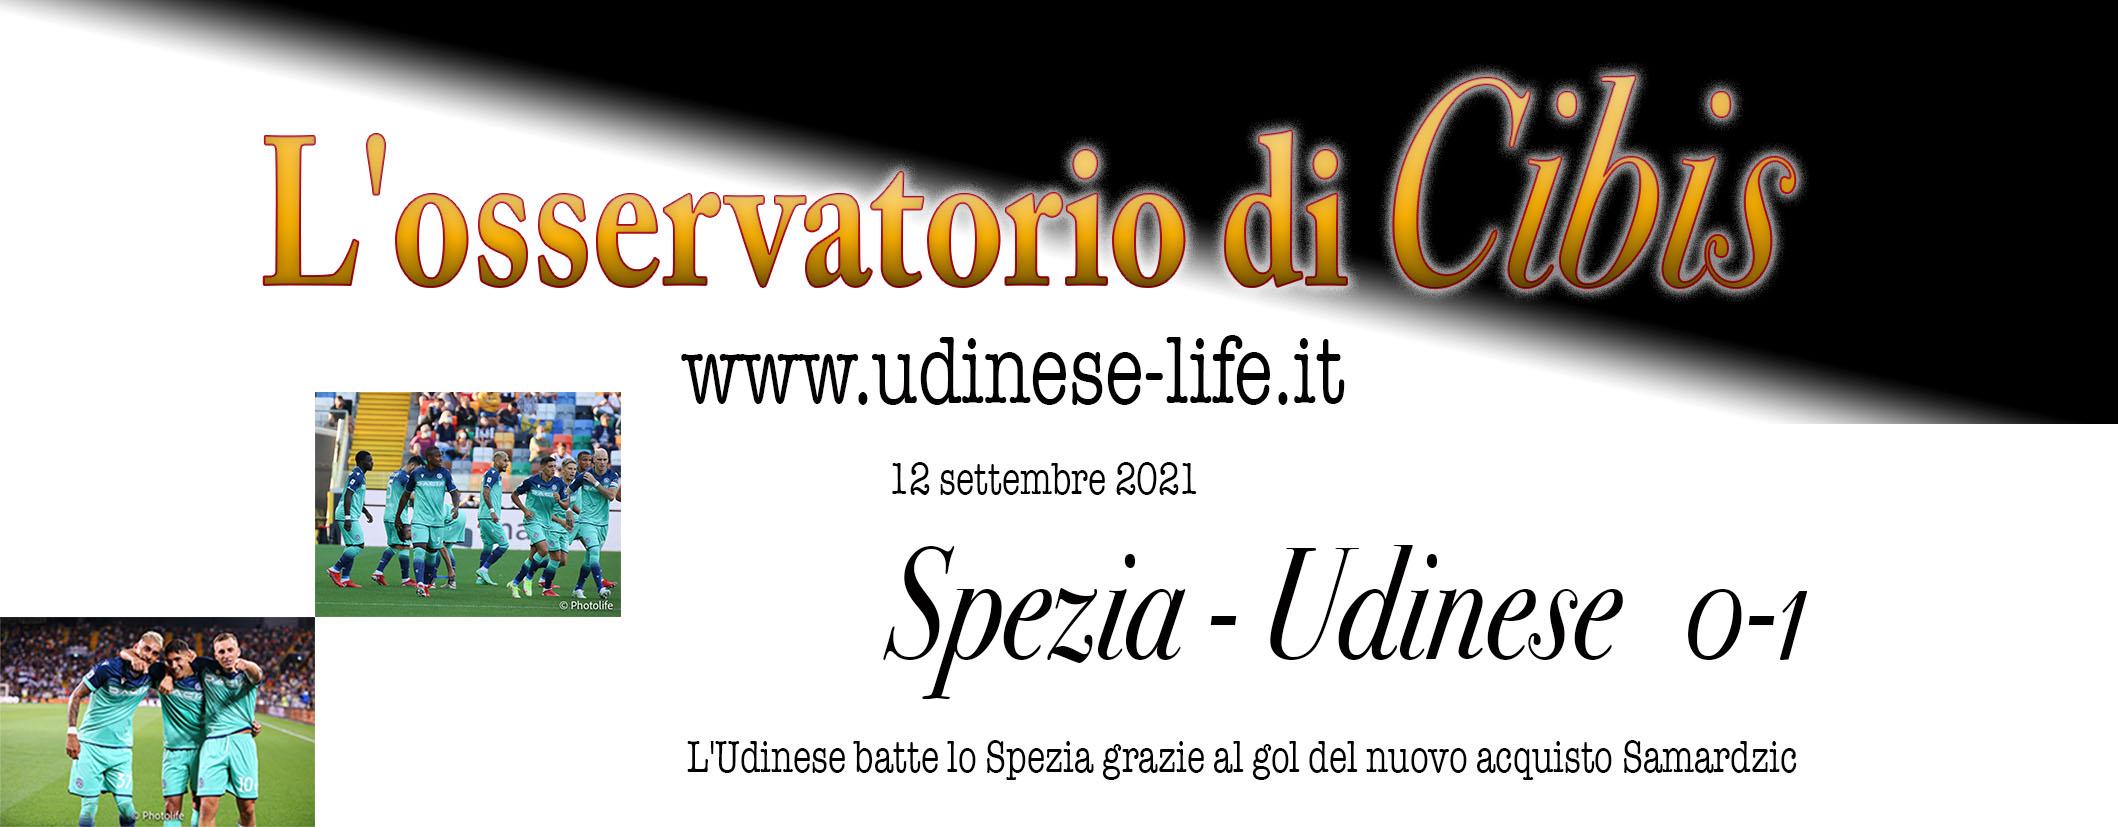 Cibis spezia Udinese-a